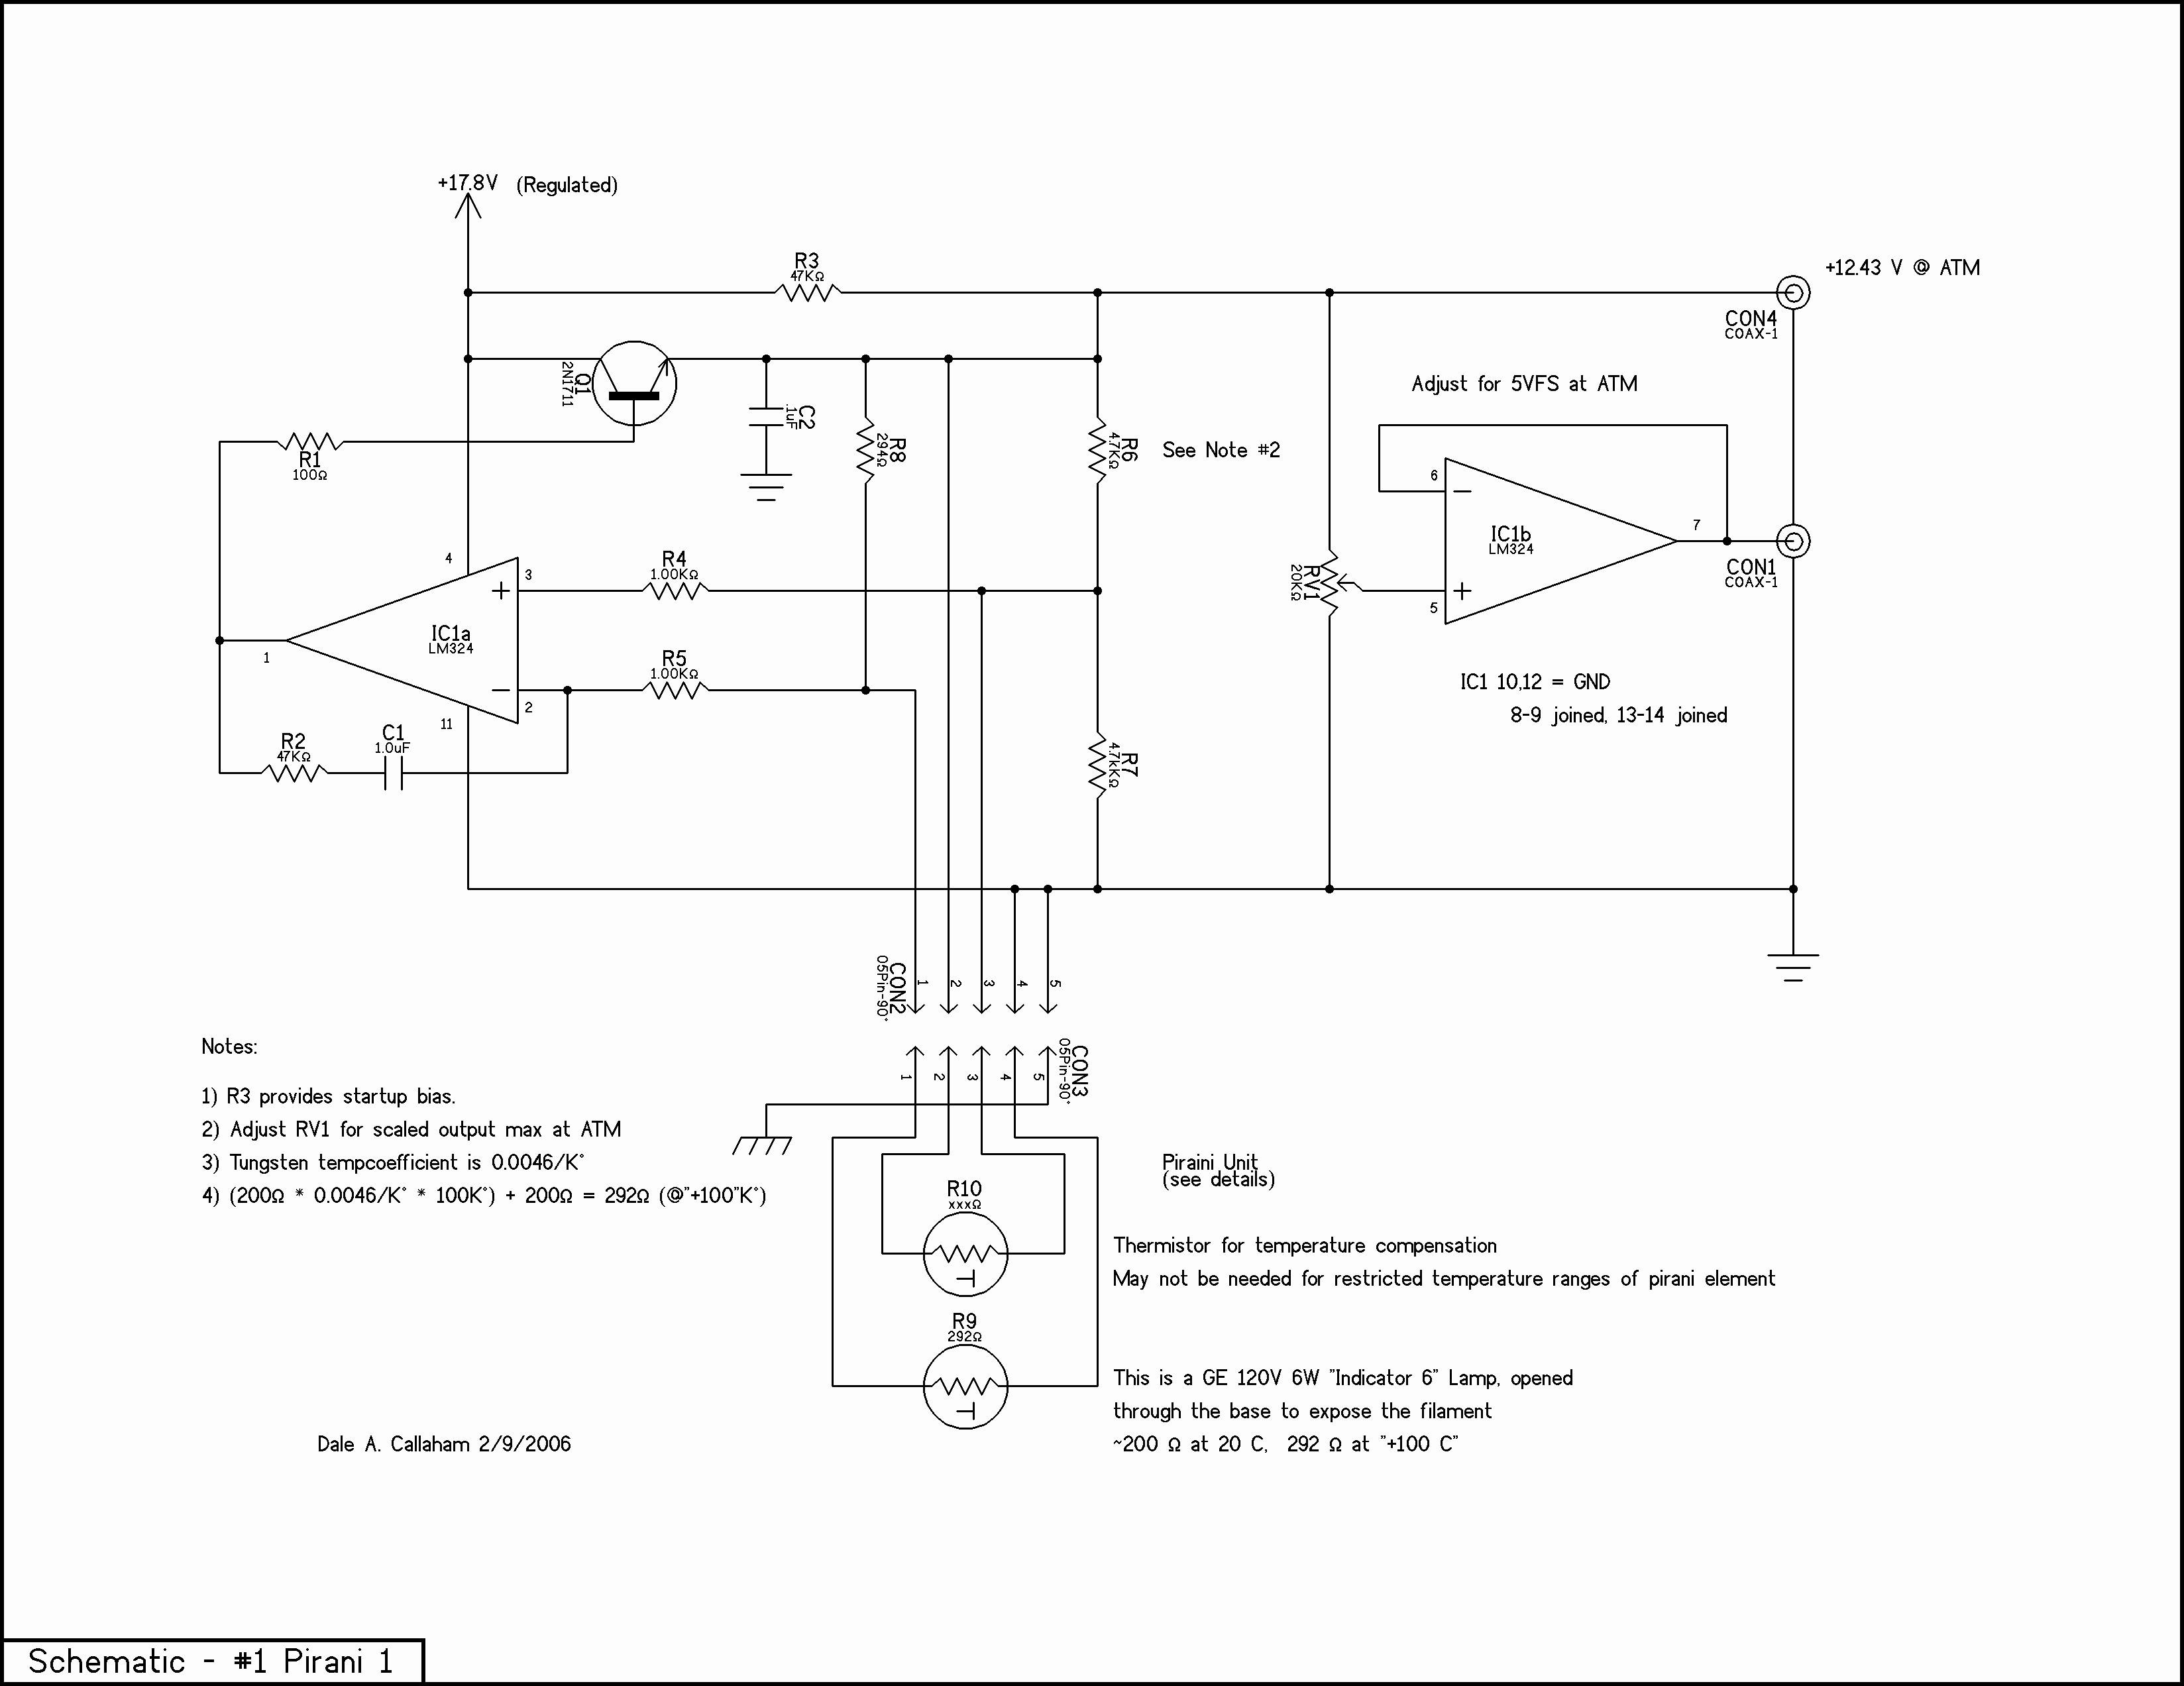 Light Wiring Diagram Electrical Floor Plan Unique Unique Light Wiring Diagram Diagram Light Wiring Diagram